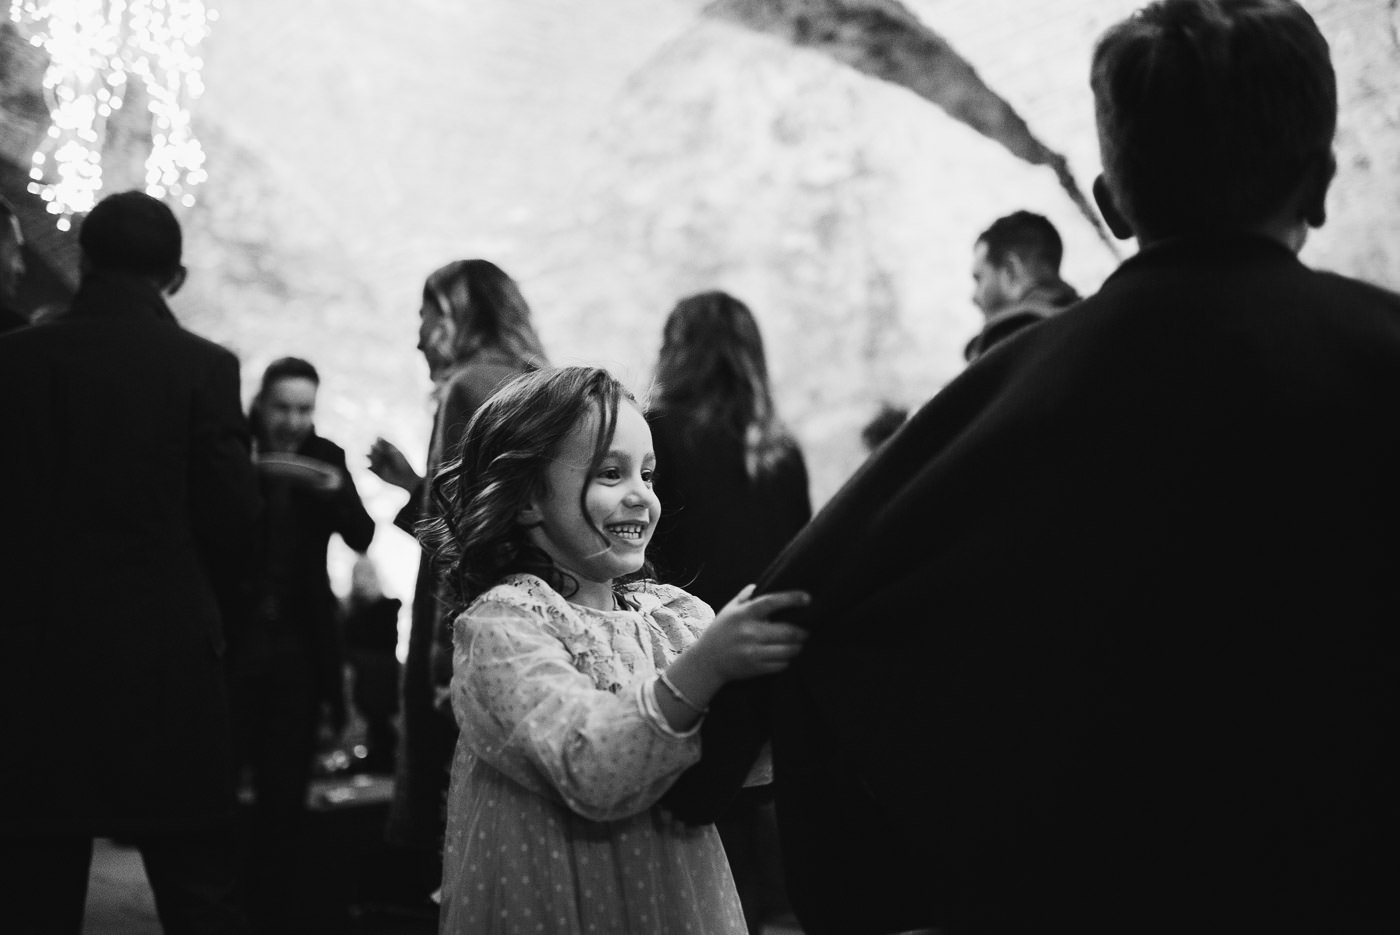 Matrimonio Giulia & Alessandro 28_12 – Alessio Nobili Photographer-52